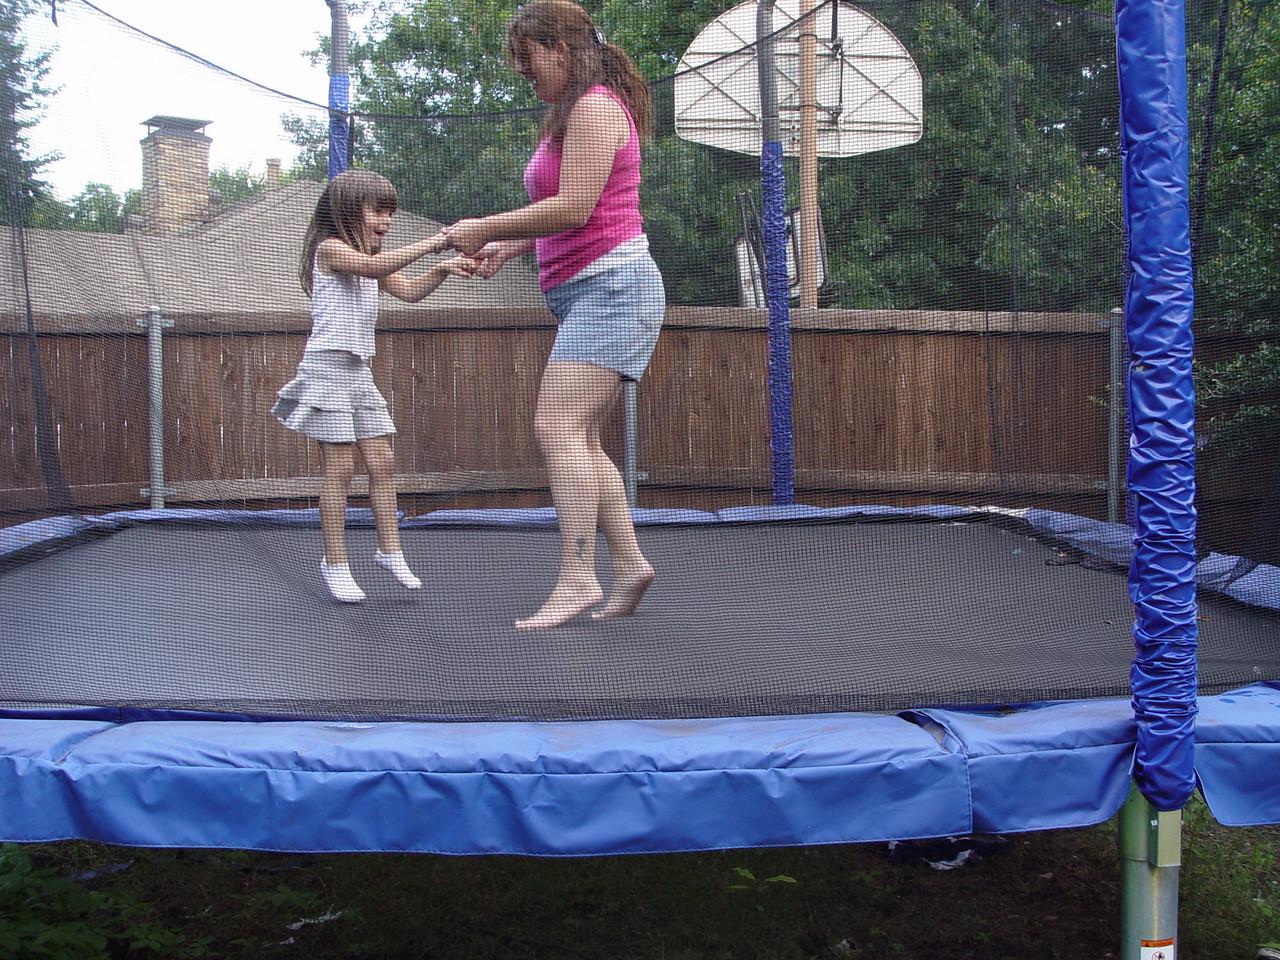 2007-07-201-Barrett-Sara-with-Soccer-dup 029